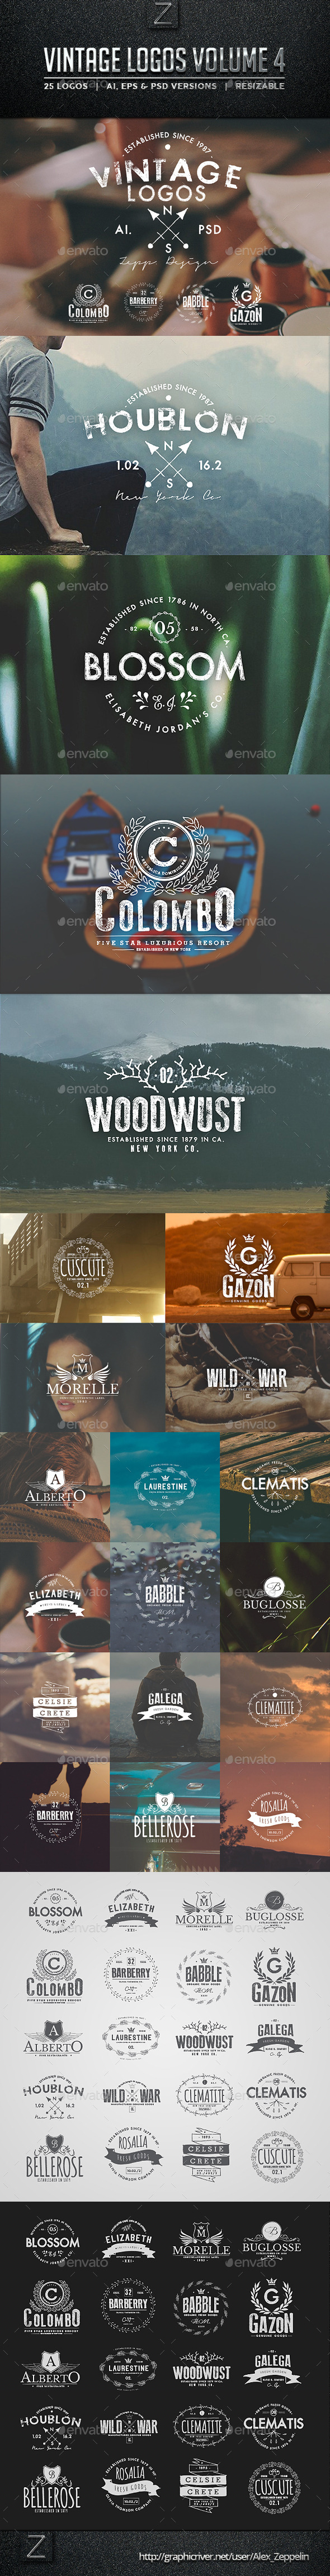 Vintage Logos and Badges Set 4 - Badges & Stickers Web Elements